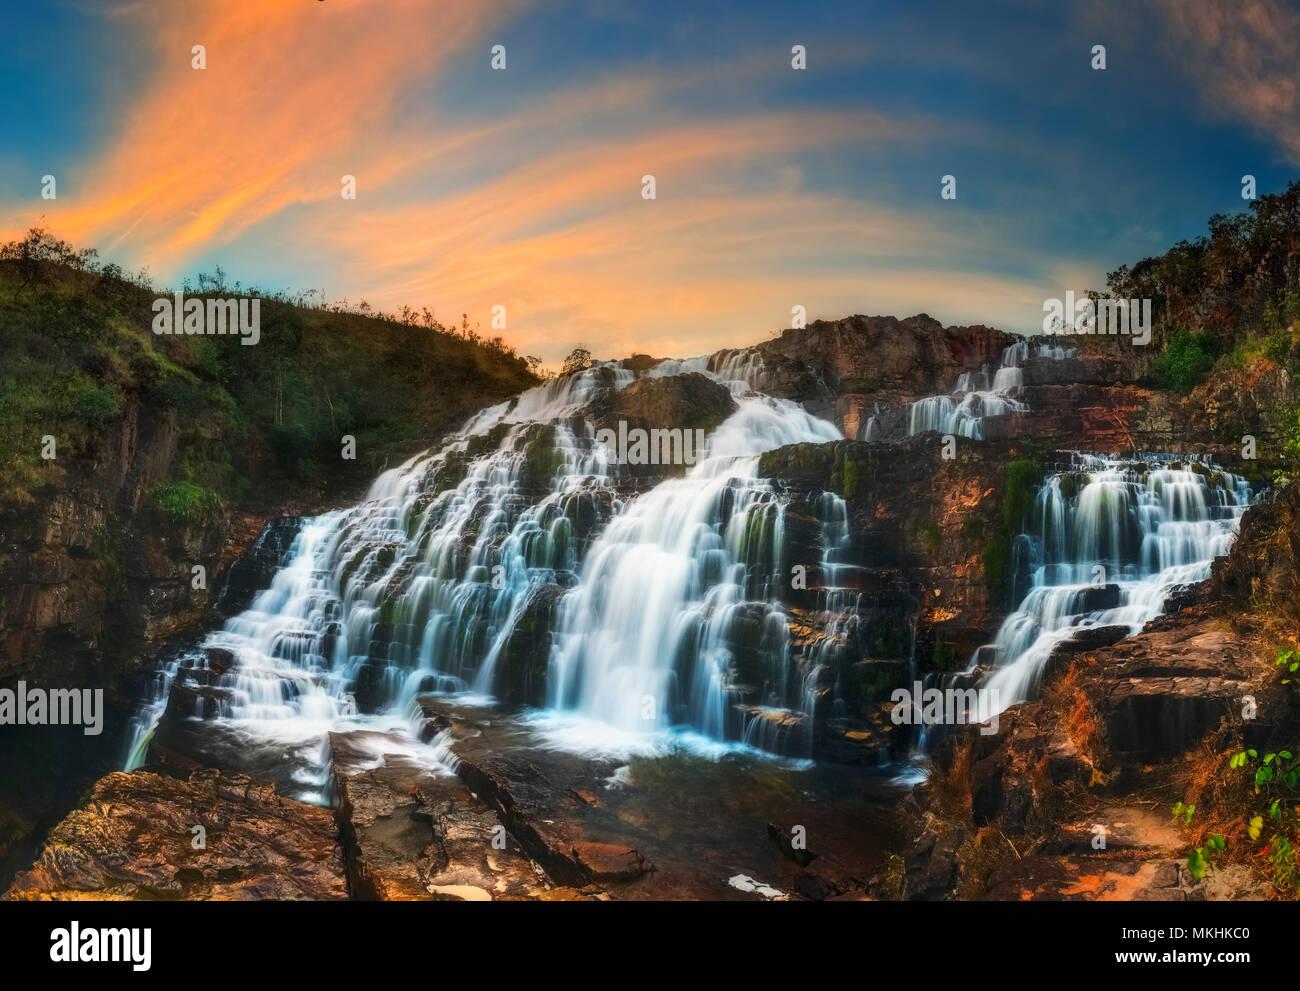 Couros Waterfall, Veadeiros tablelands Brazil. - Stock Image